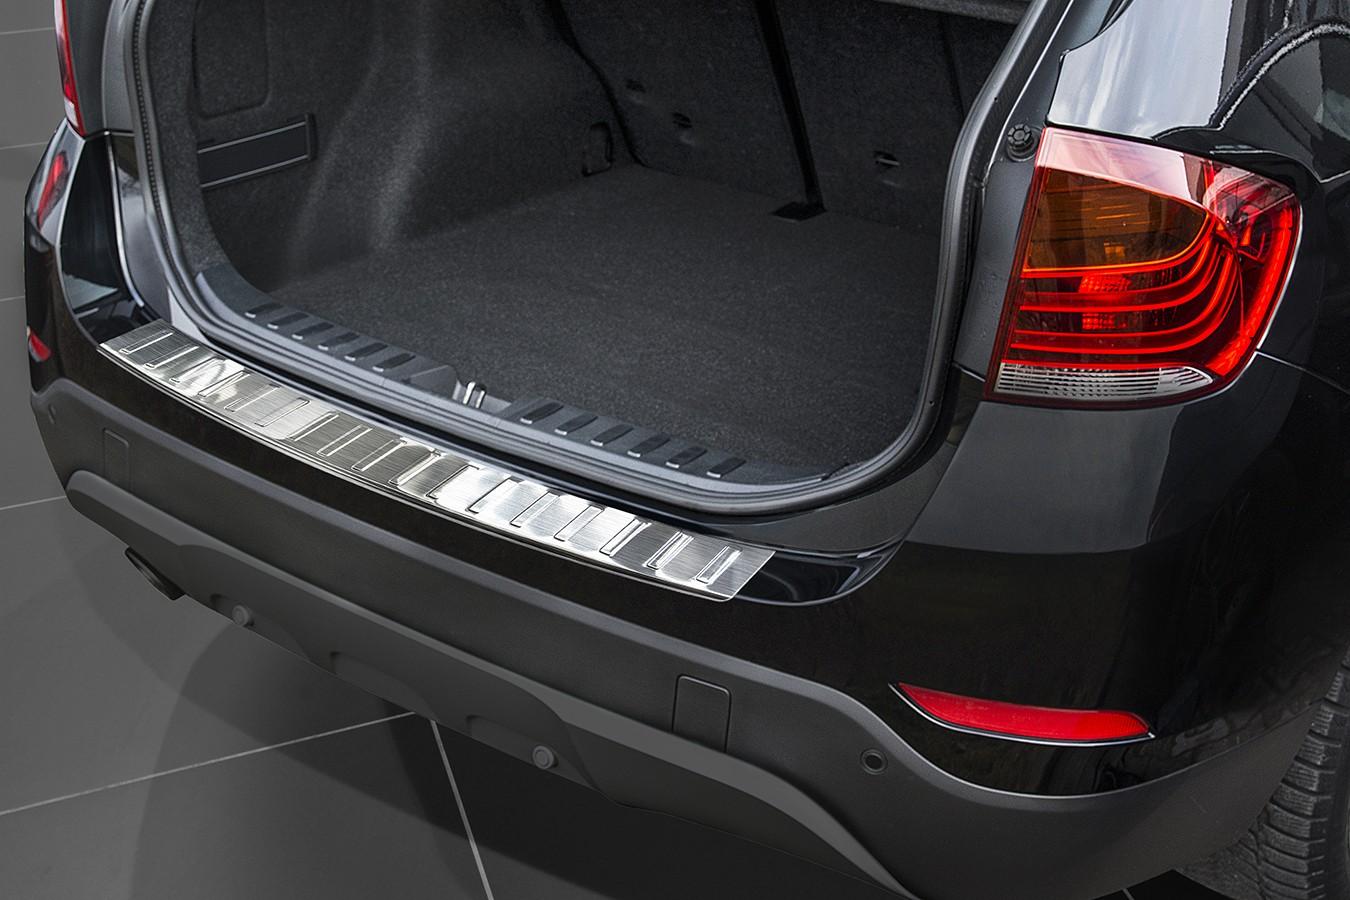 BMW 1 E87 (5d) E81(3d) 2007-2011